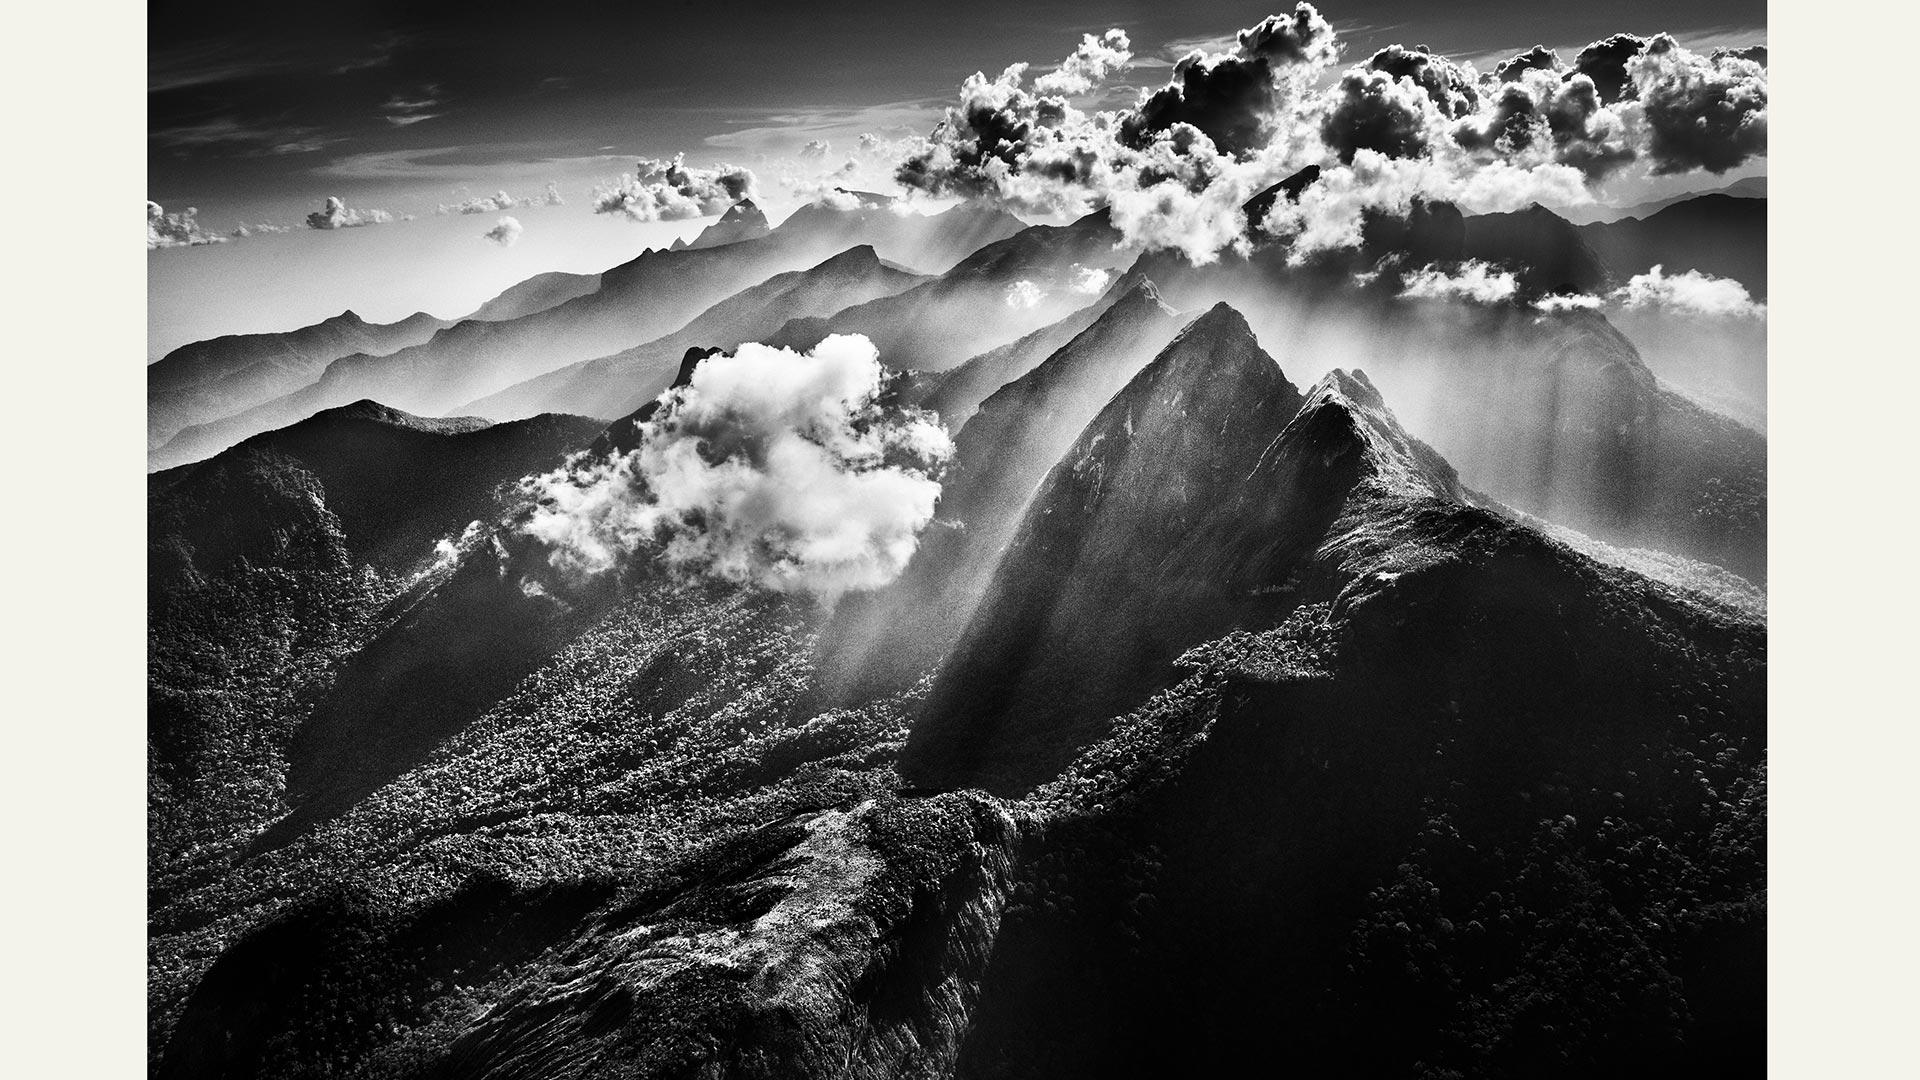 Berge in dramatischem Licht Sebastião Salgado. Amazônia TASCHEN Sebastião Salgado, Lélia Wanick Salgado